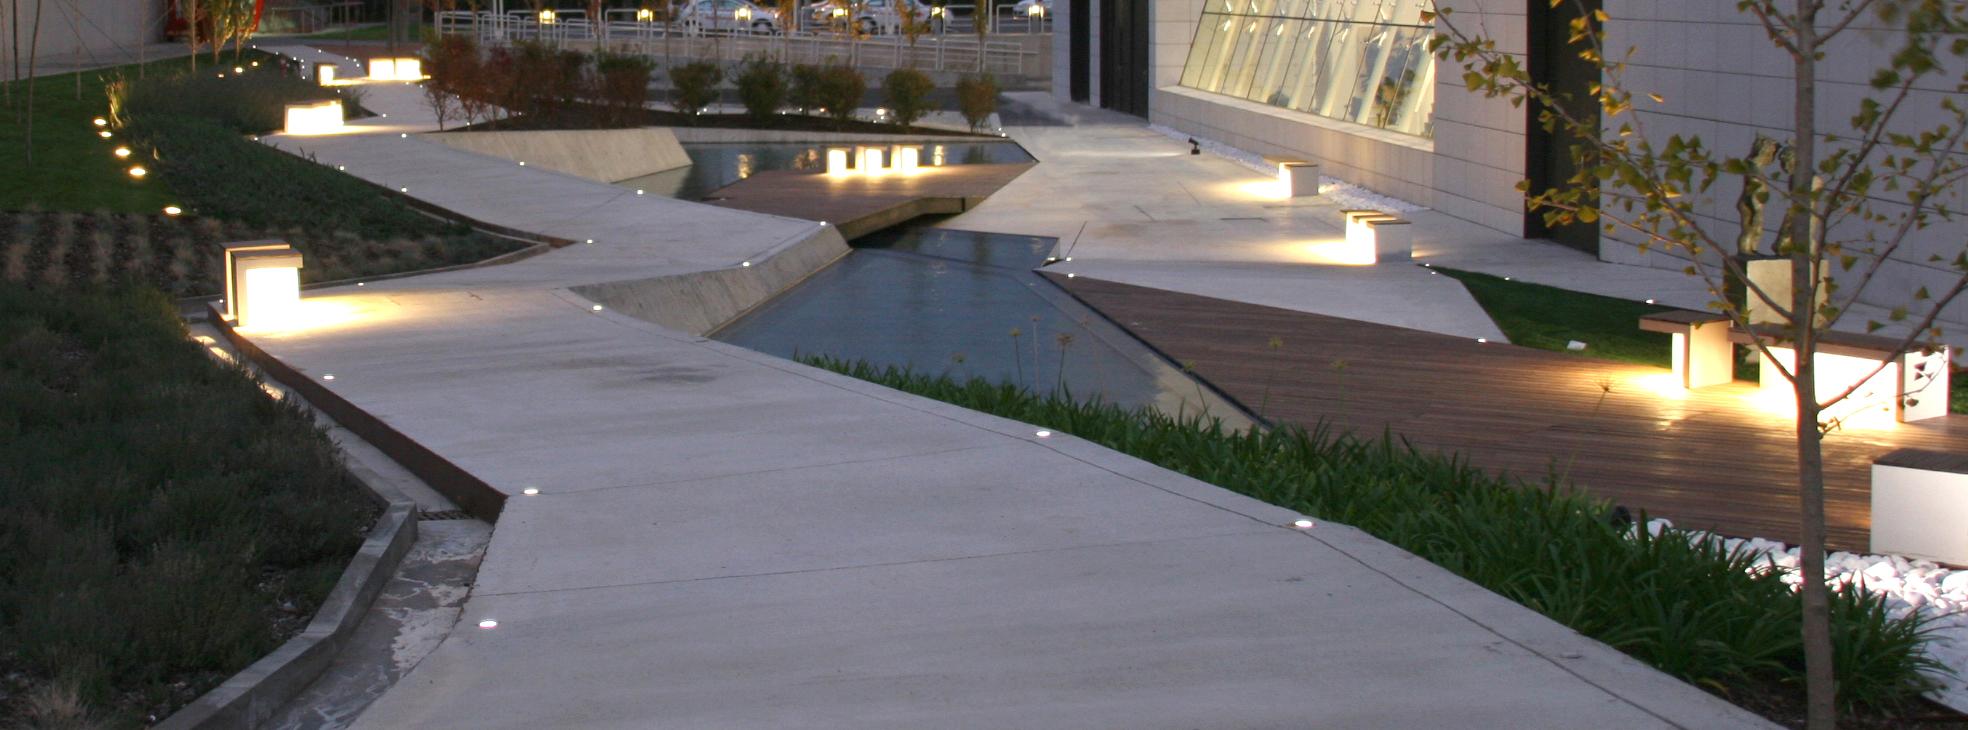 Jardines del museo w rth la rioja en agoncillo logro o for Arquitectura de jardines